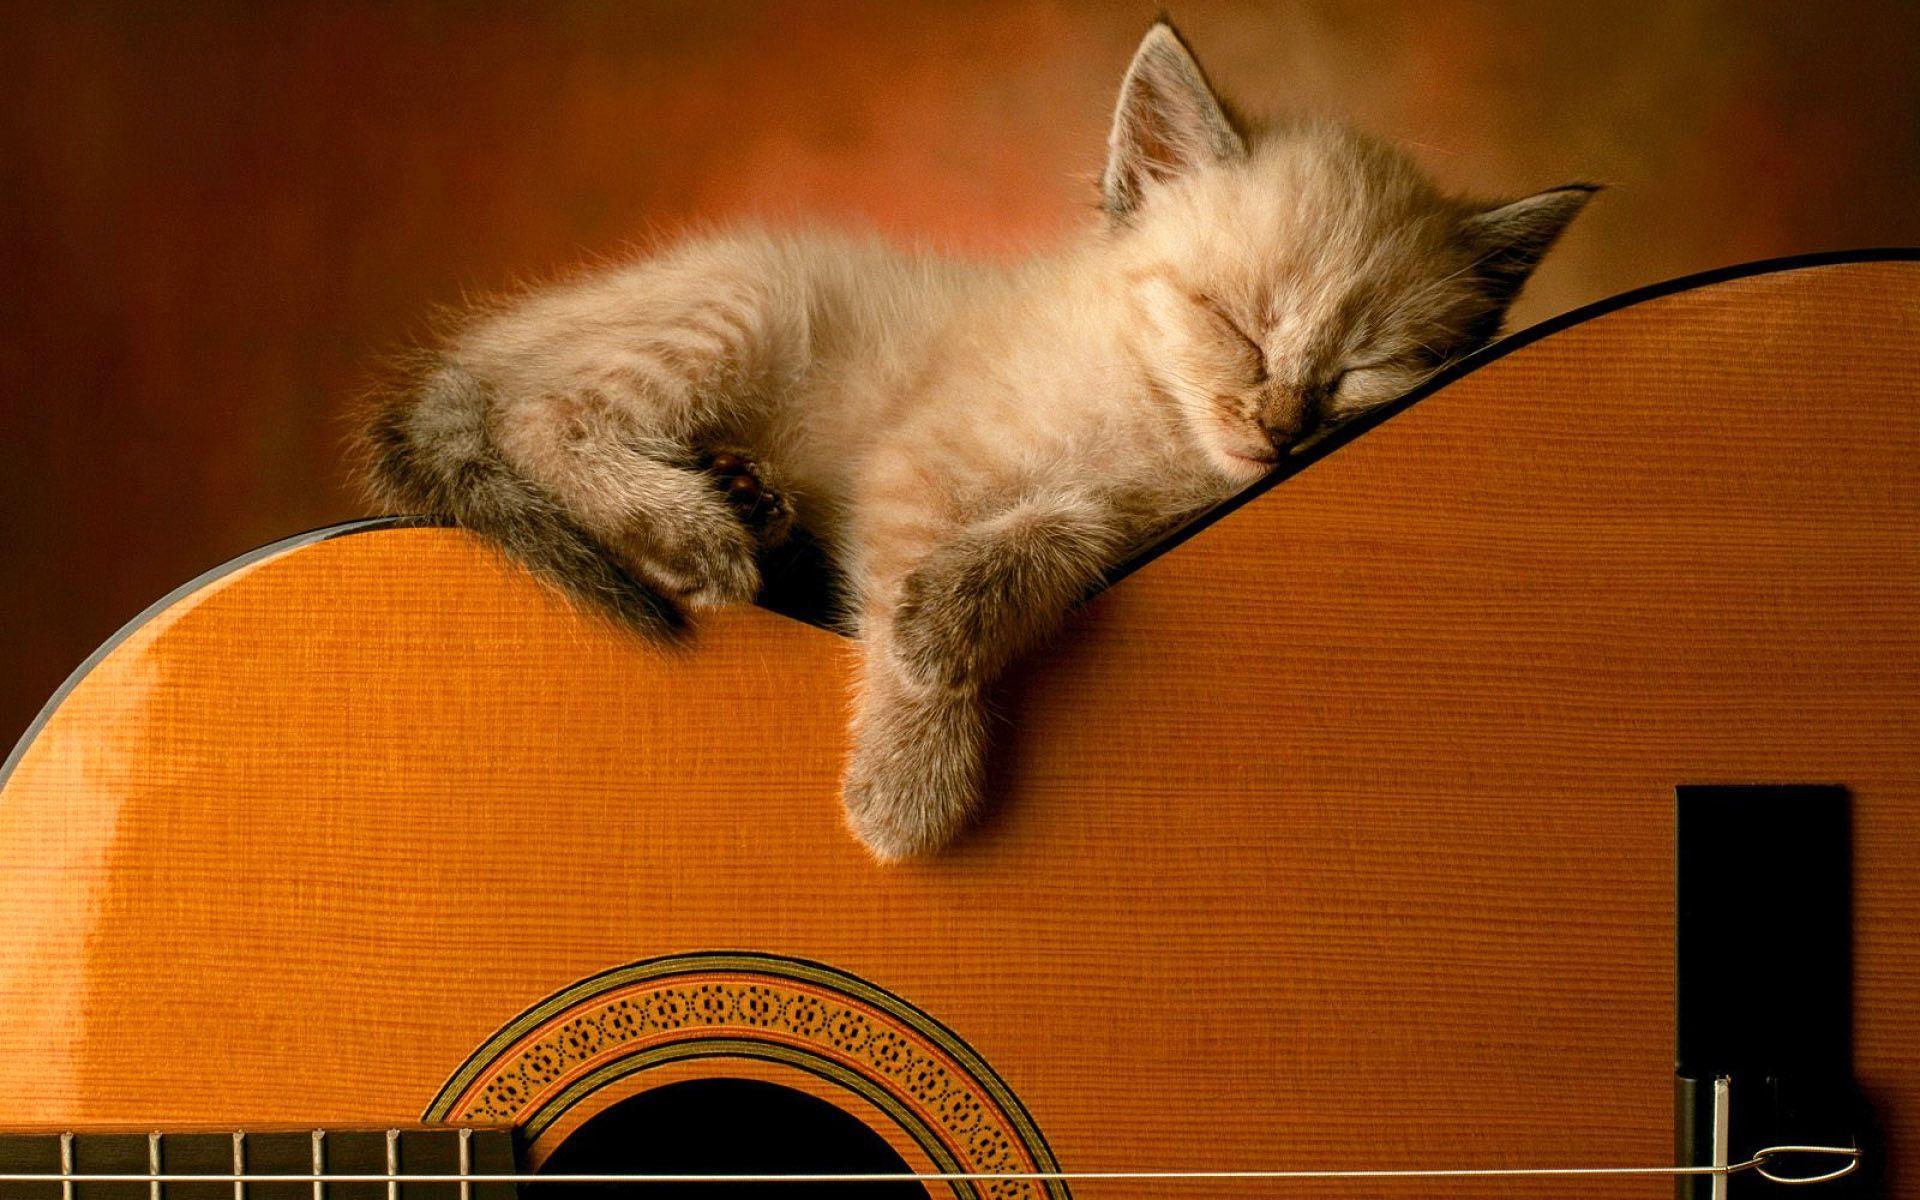 Kedi Gitar Muzik Calming Music Sleeping Animals Sleeping Kitten